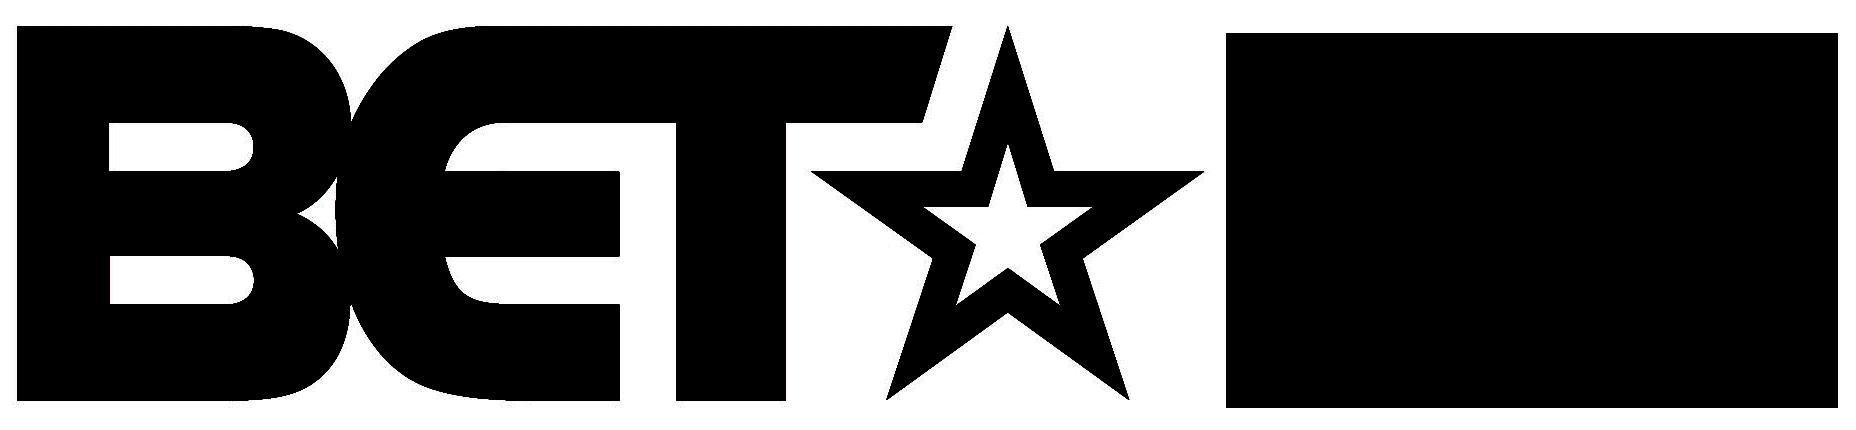 Itv2 Hd Logo PNG - 112449